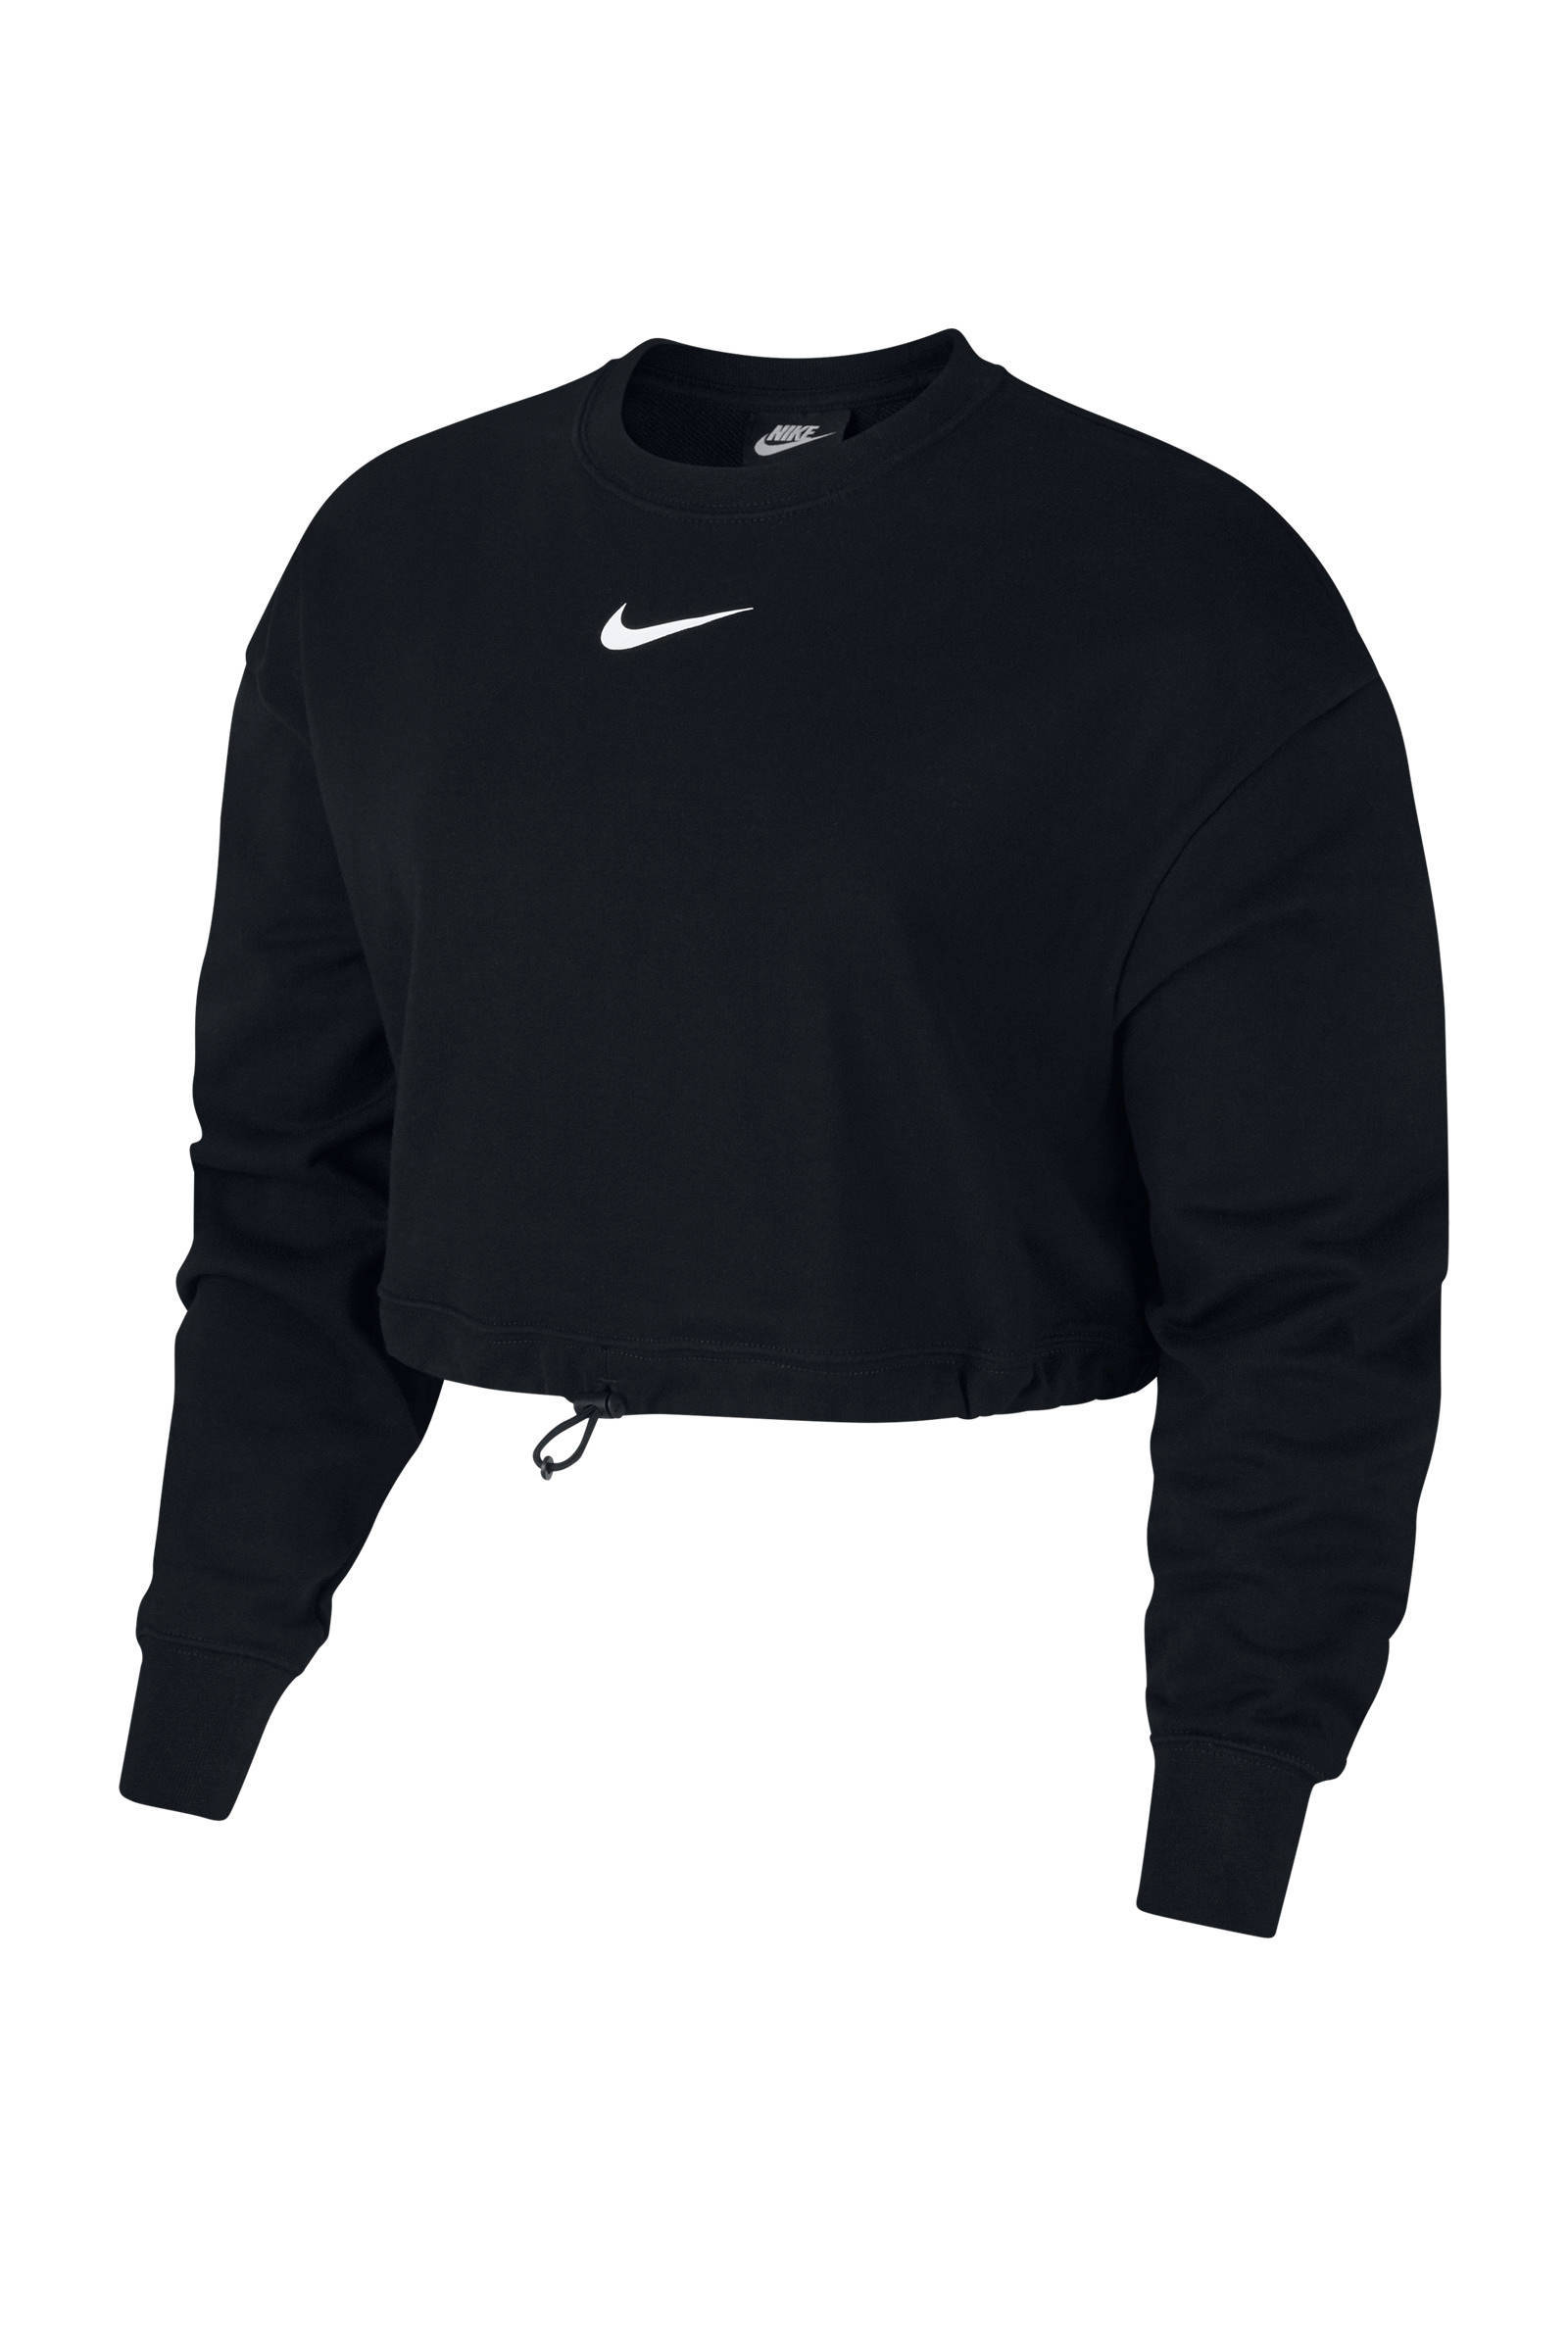 Nike cropped sweater paars | wehkamp